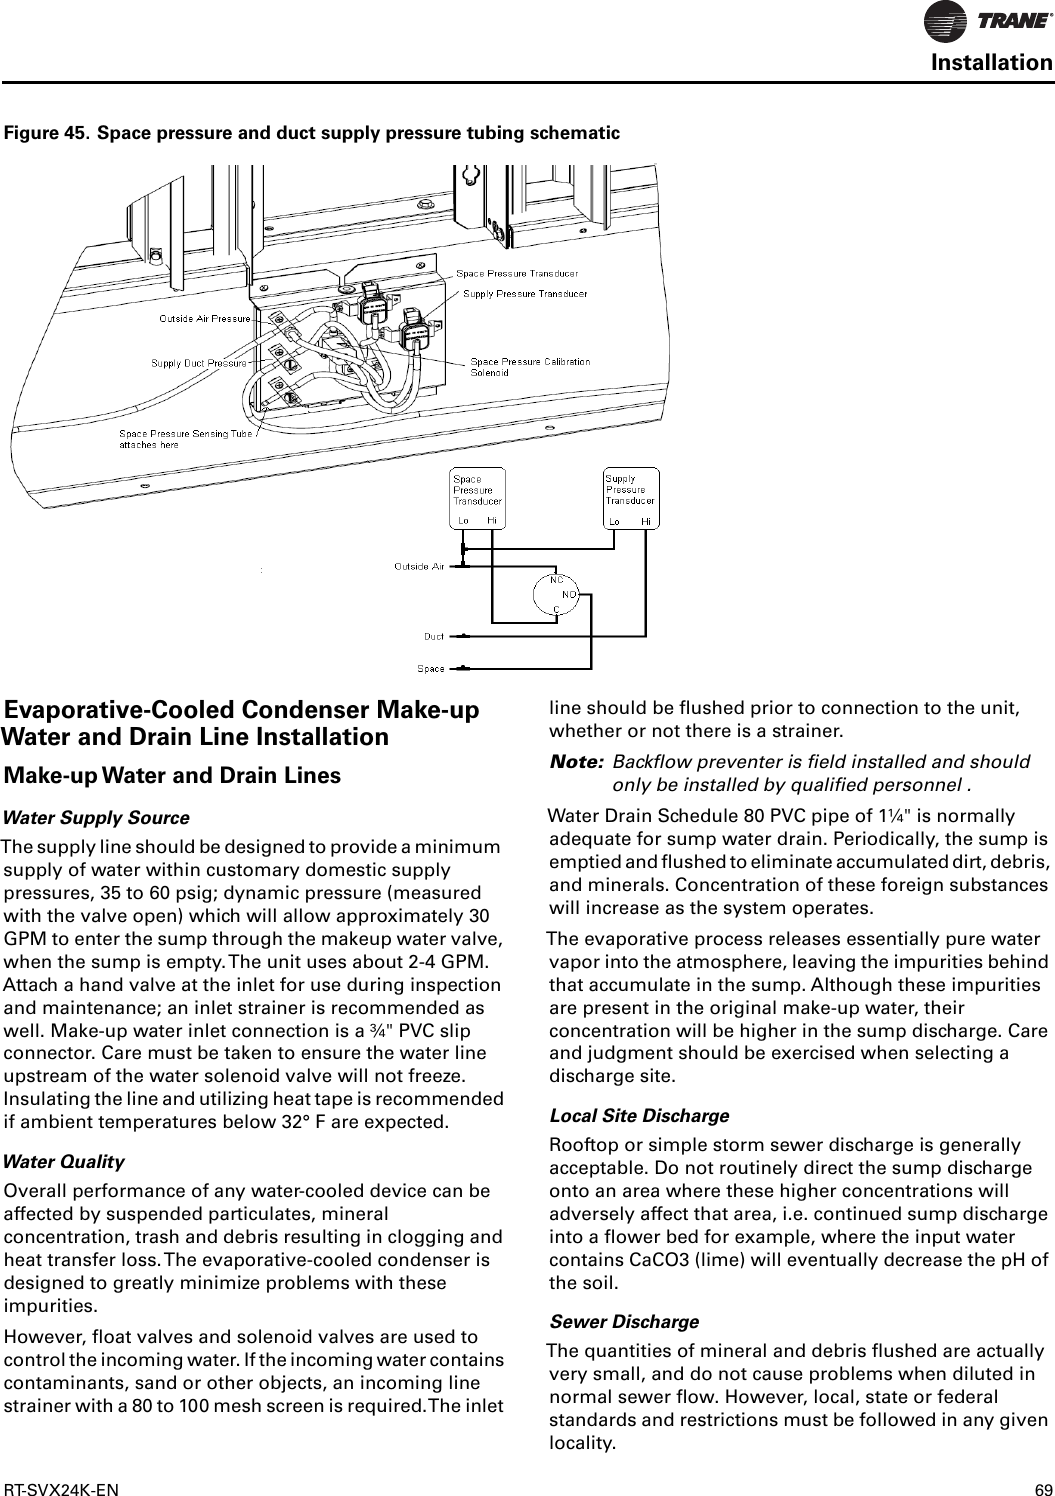 Großartig 69 Schaltplan Der Mustang Spule Ideen - Elektrische ...